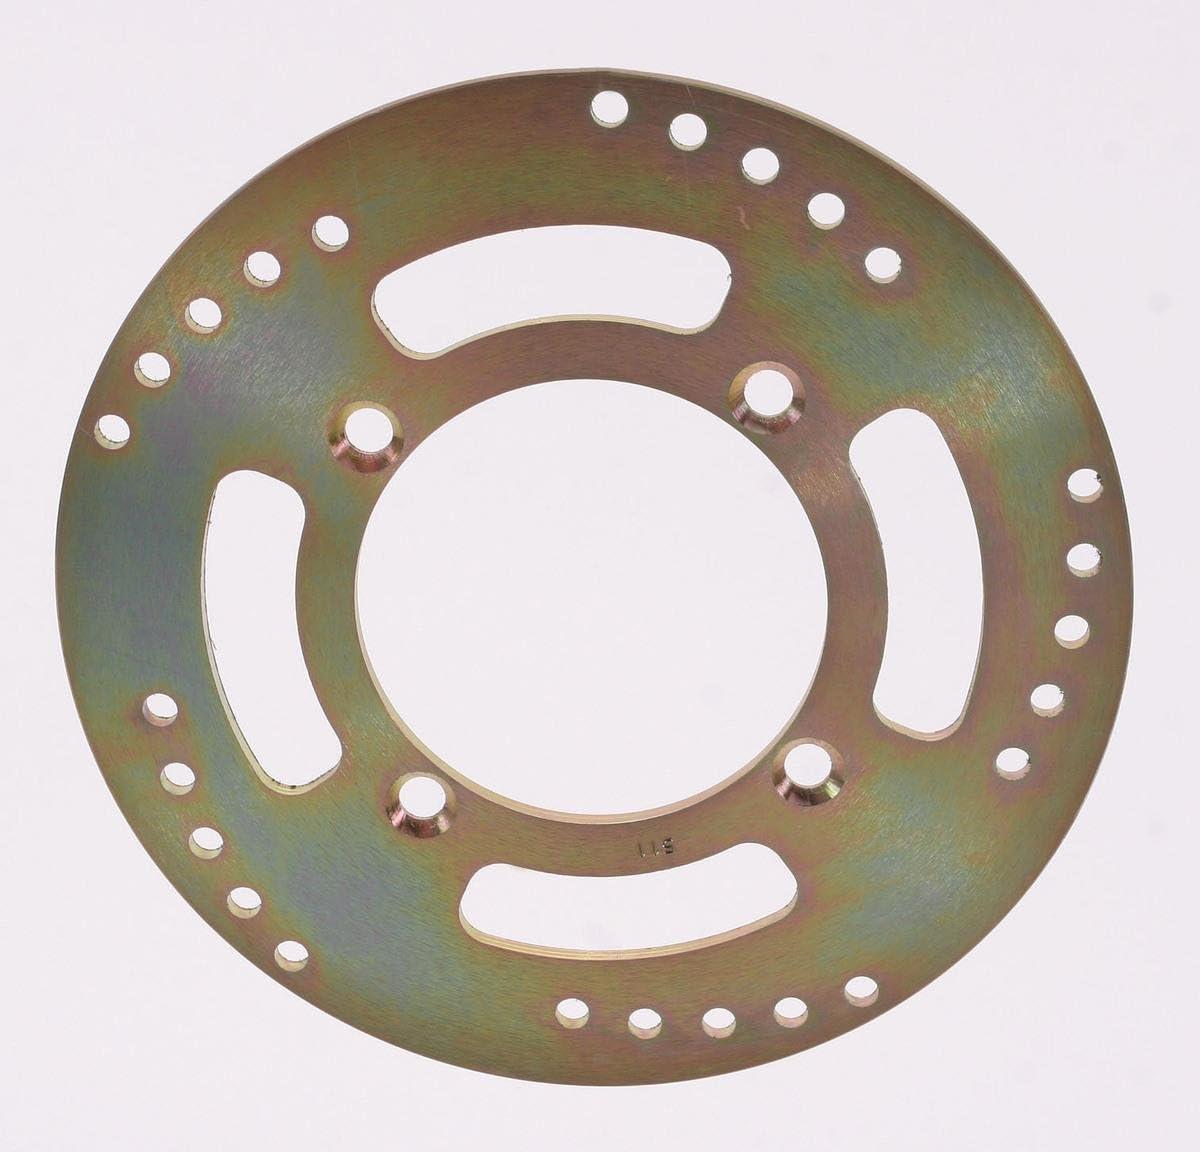 CALTRIC 2 REAR BRAKE DISC ROTOR FITS Polaris 5248250